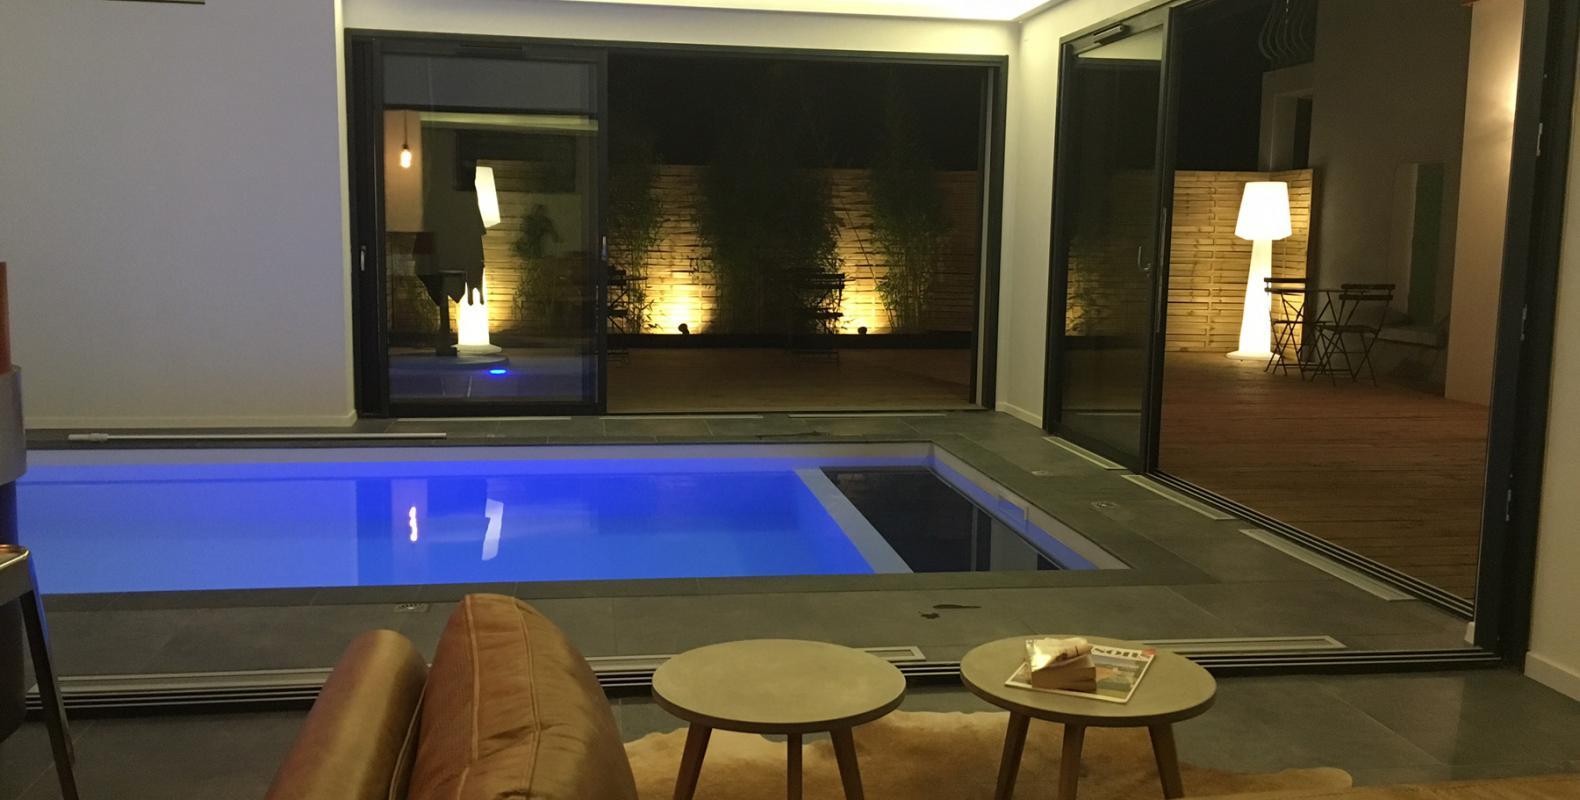 Hotel Avec Piscine Interieure Clermont Ferrand